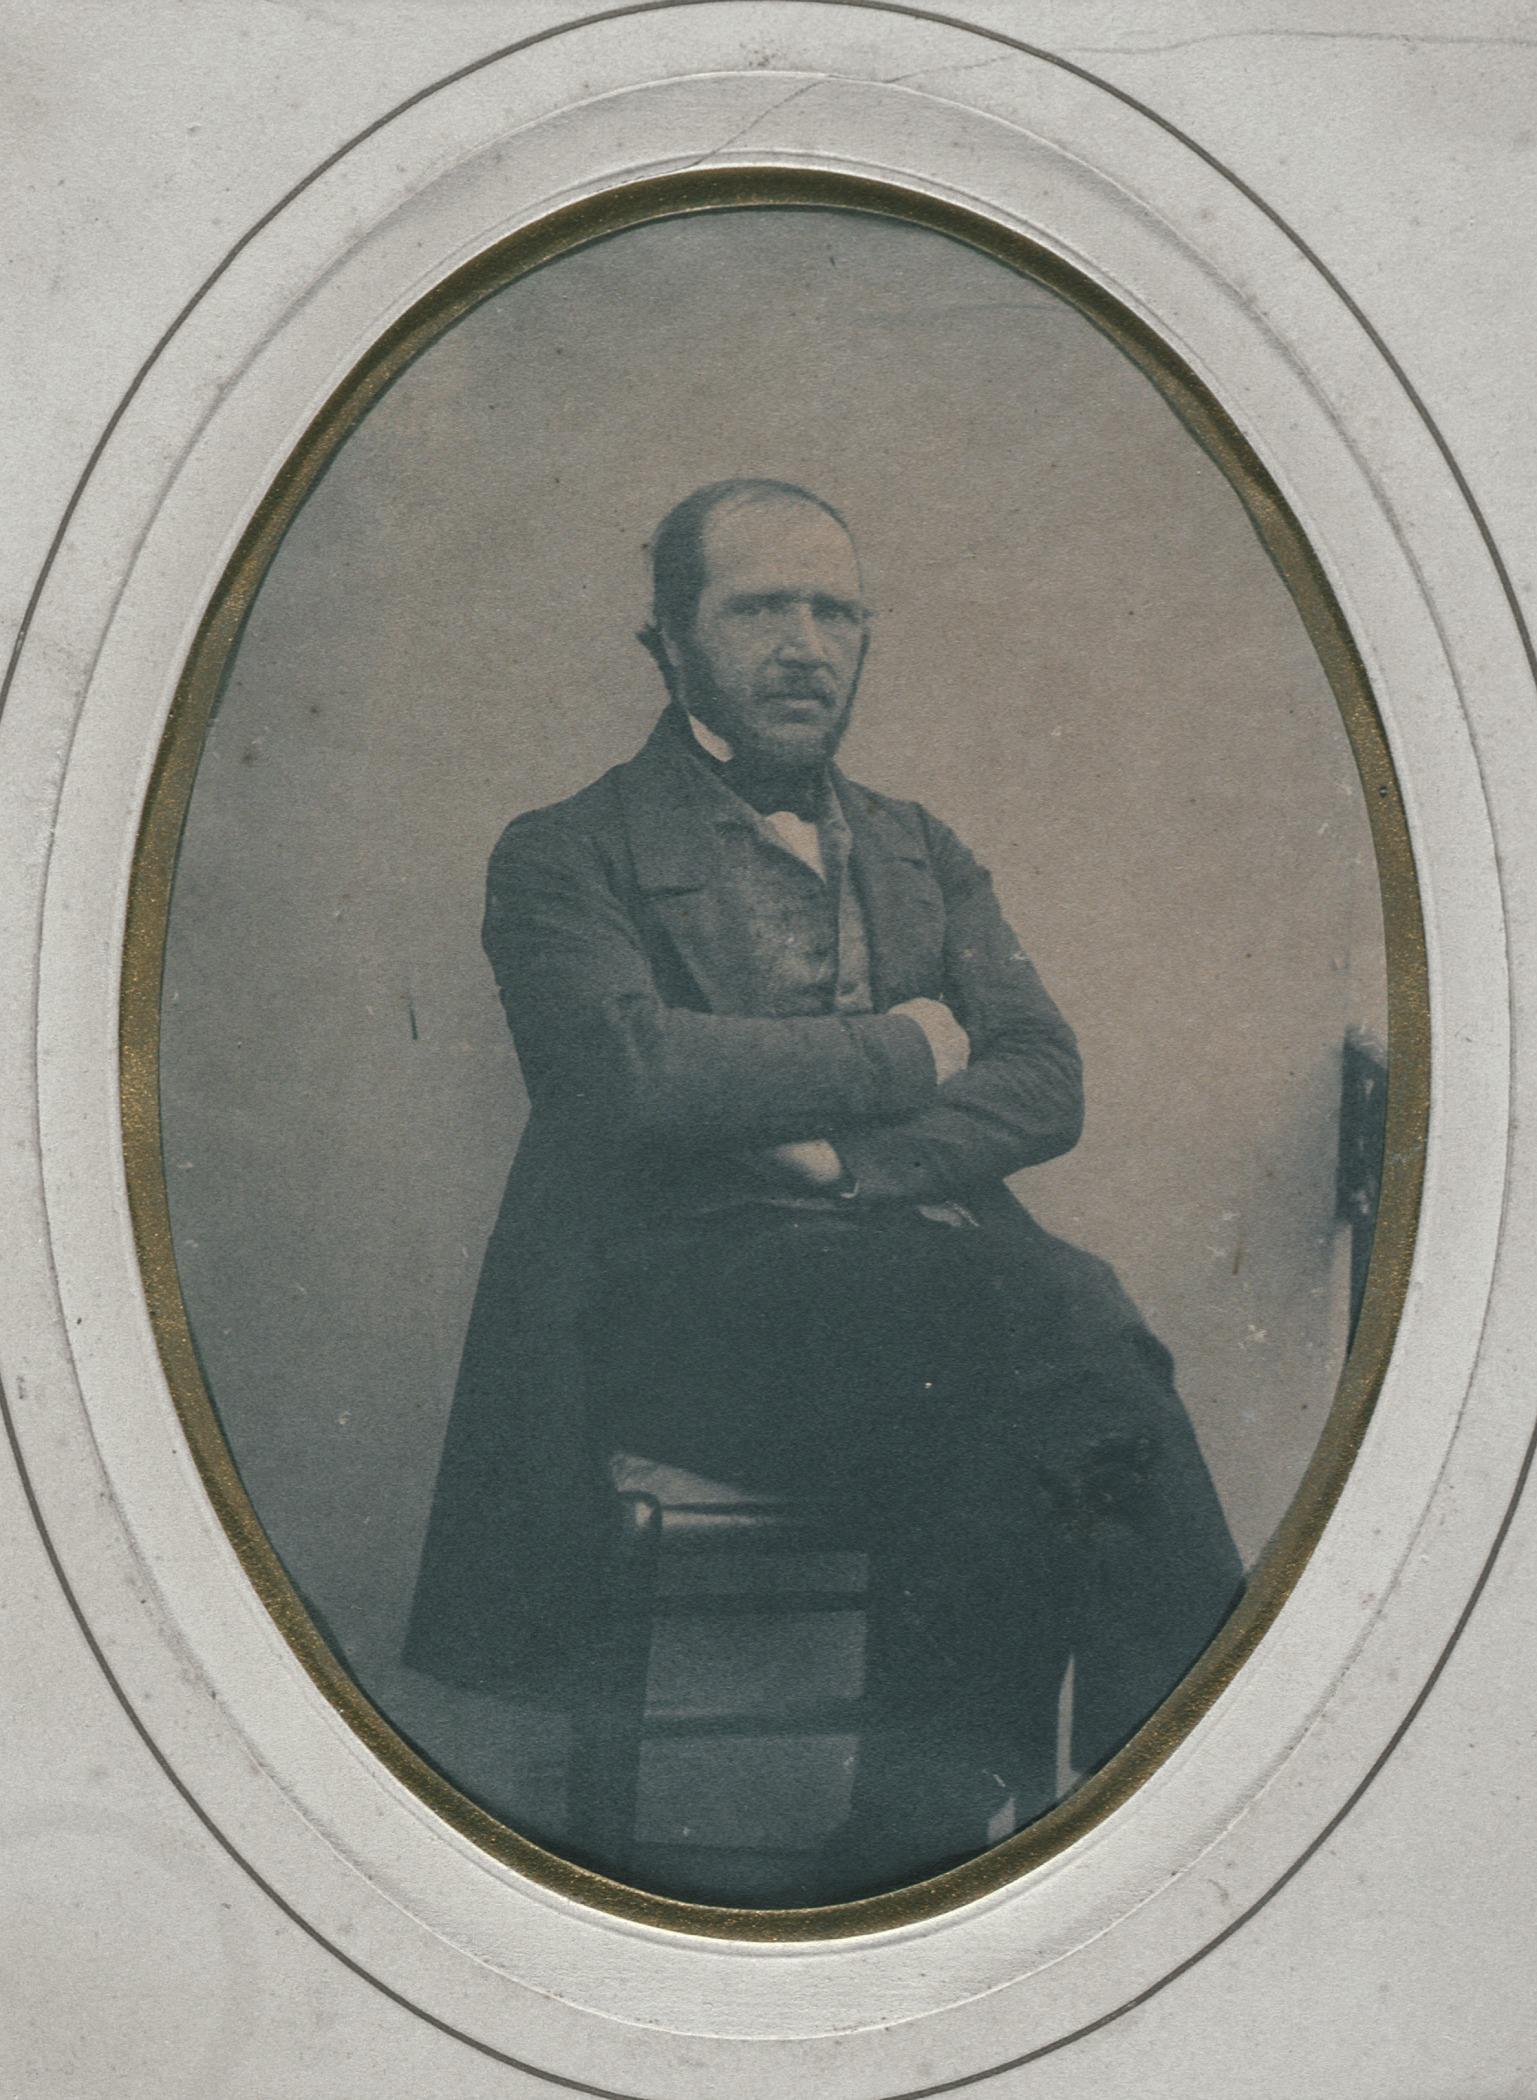 Self-Portrait by Alphonse-Louis Poitlevin (France, 1819-1882)